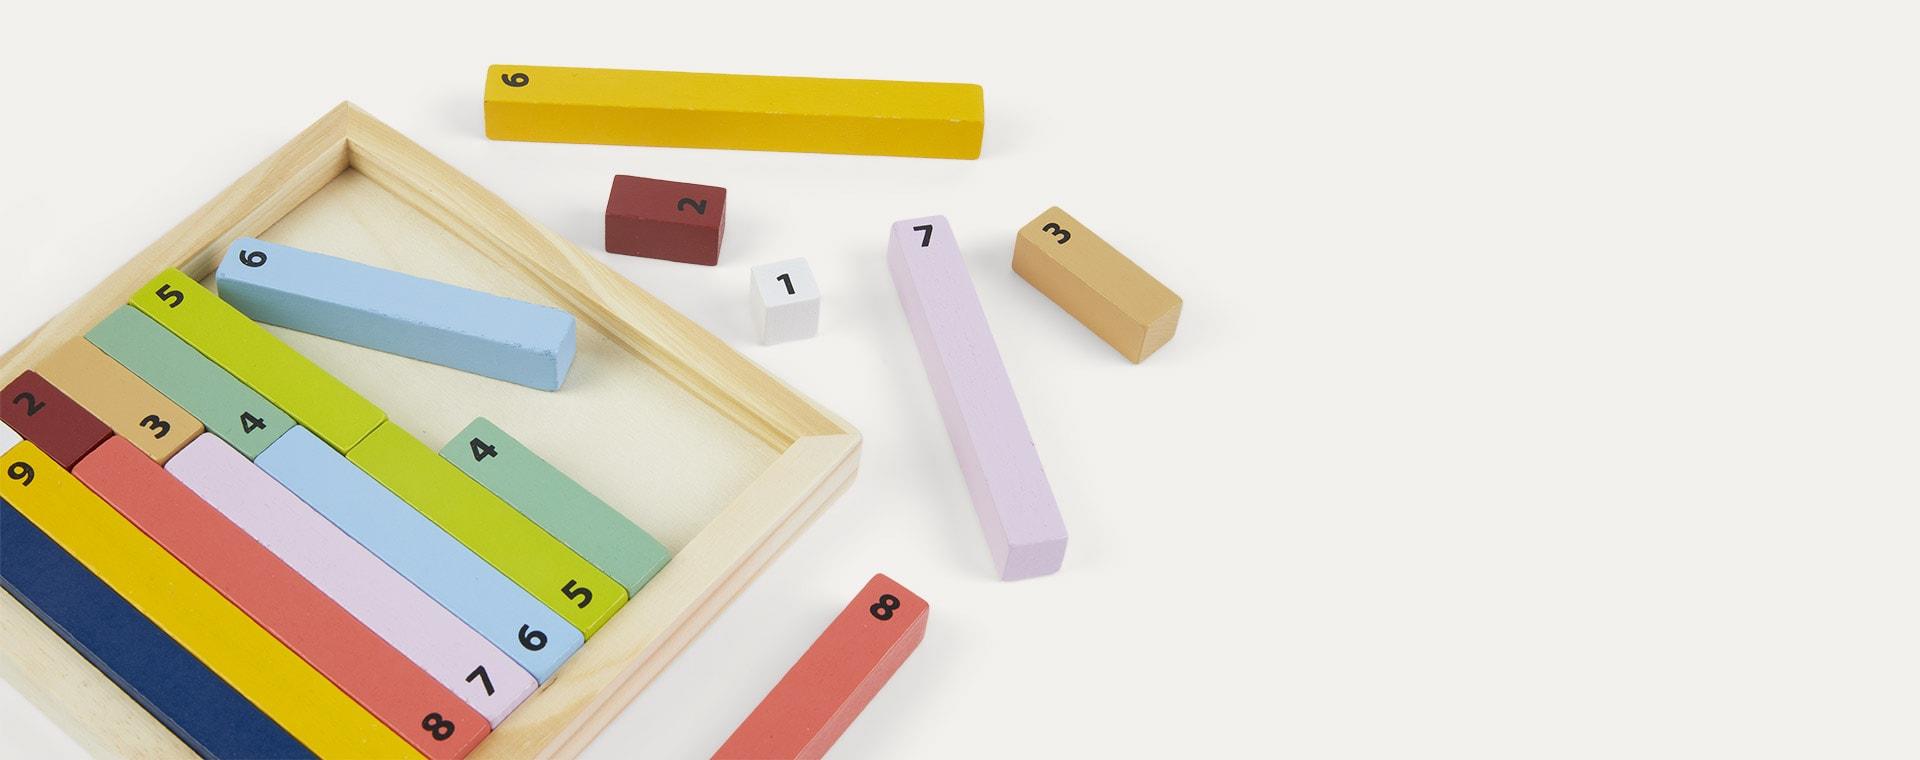 Multi Legler Toys Educate Counting Sticks